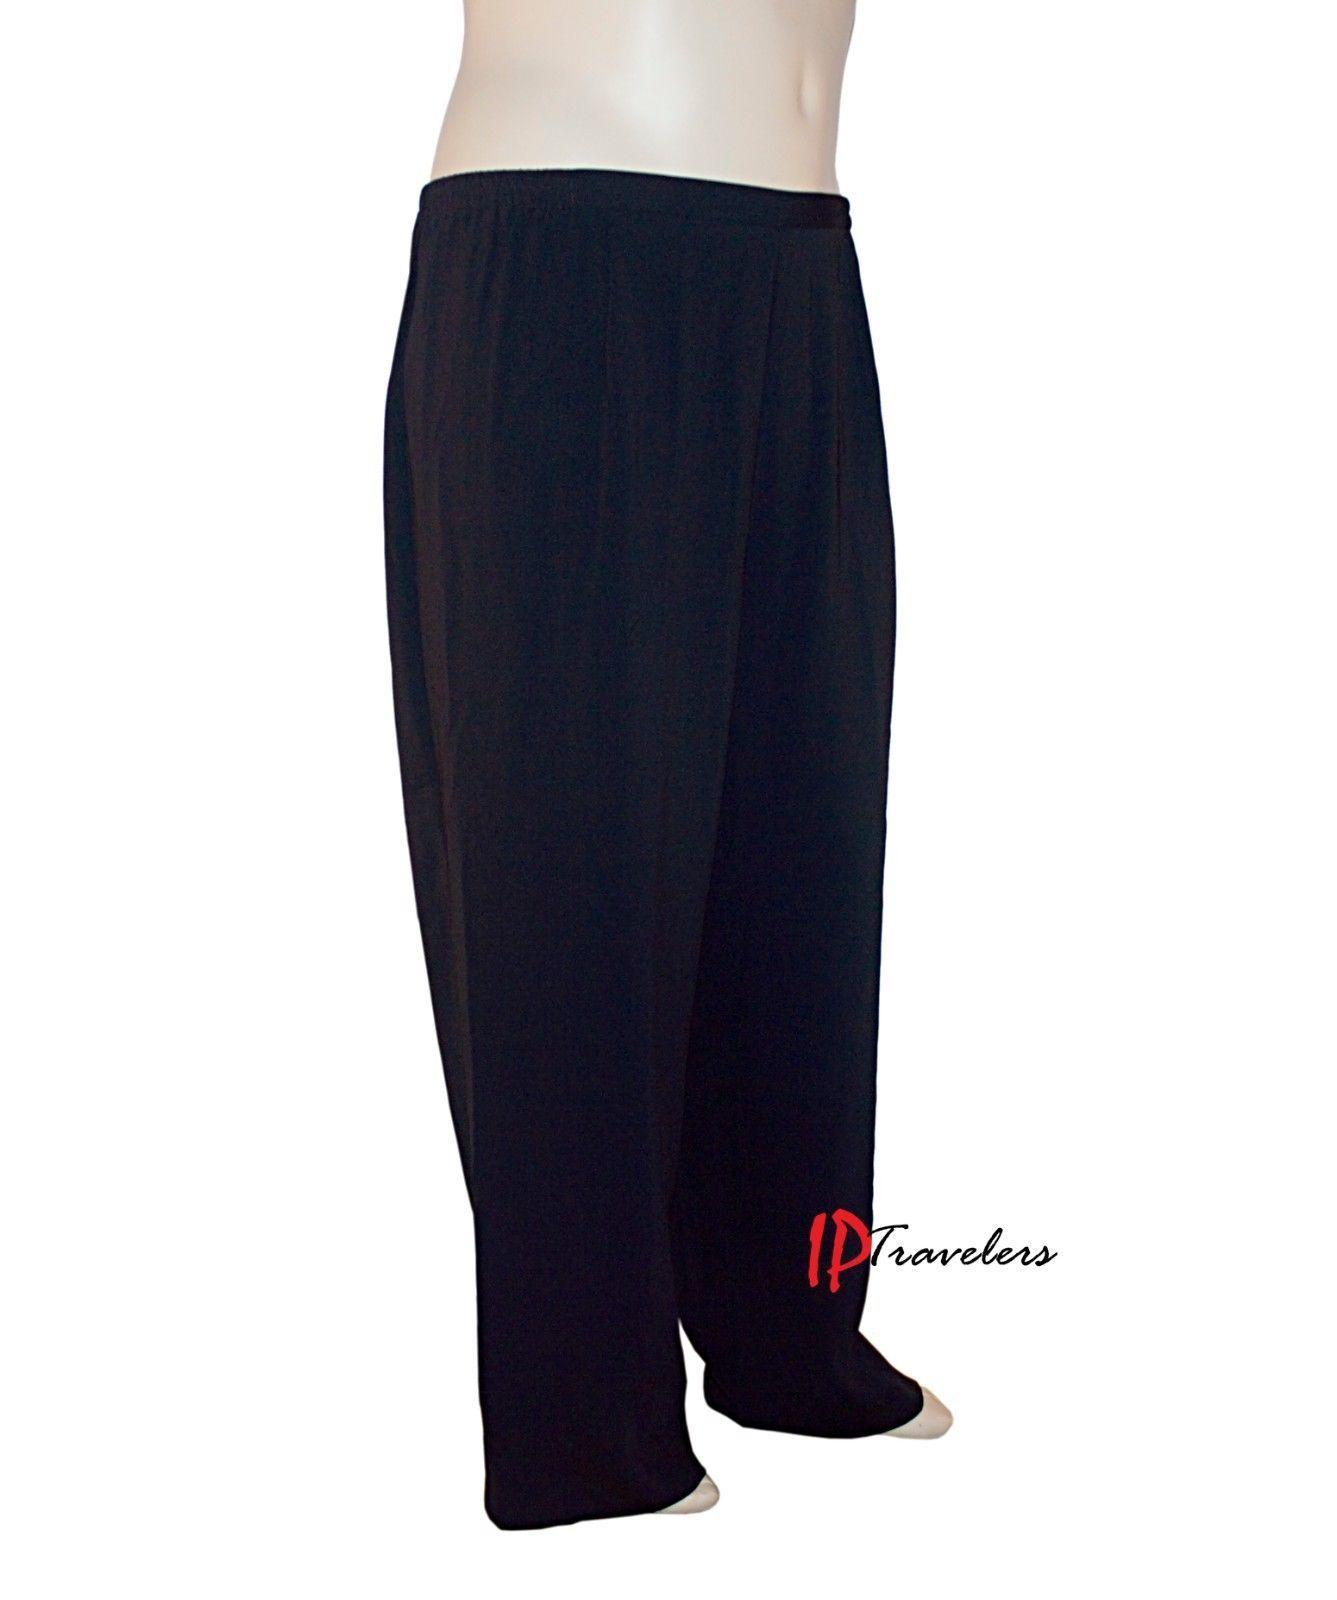 Charter Club Women's Pants Size 24W Stretch Black 100% Polyester $69 NWOT